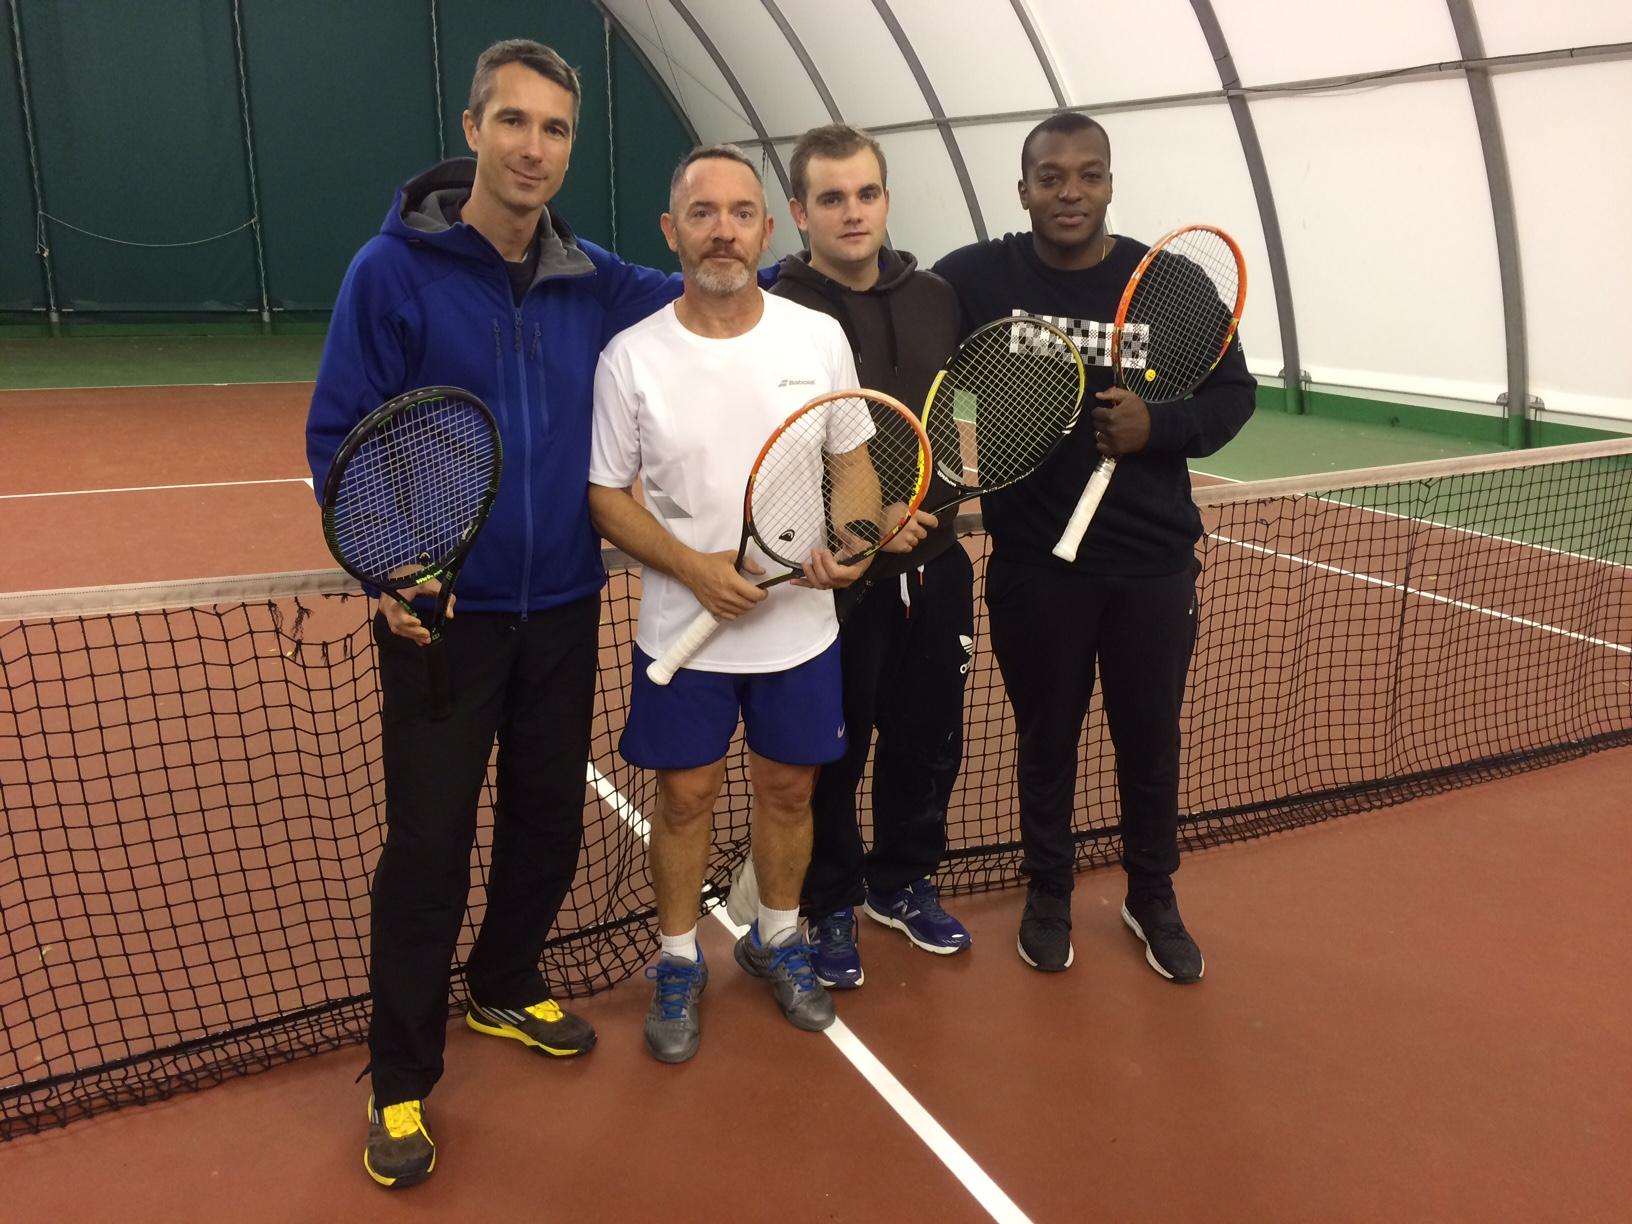 Club sportif artistique fort kremlin bic tre - Kremlin bicetre tennis de table ...